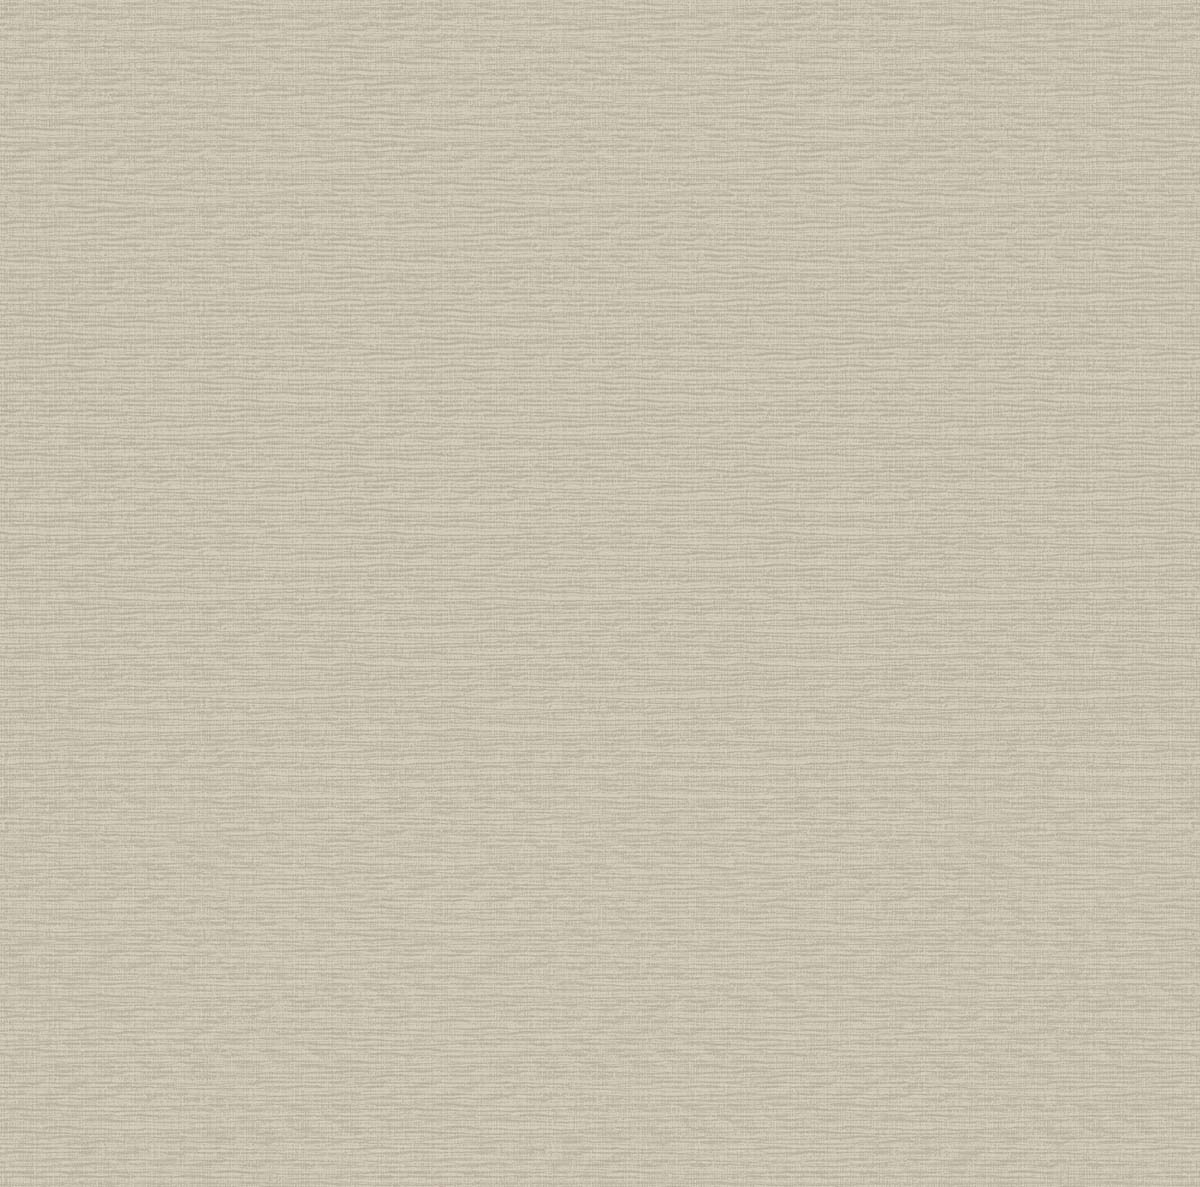 Pagoda-wallpaper-seagrass-MH00429